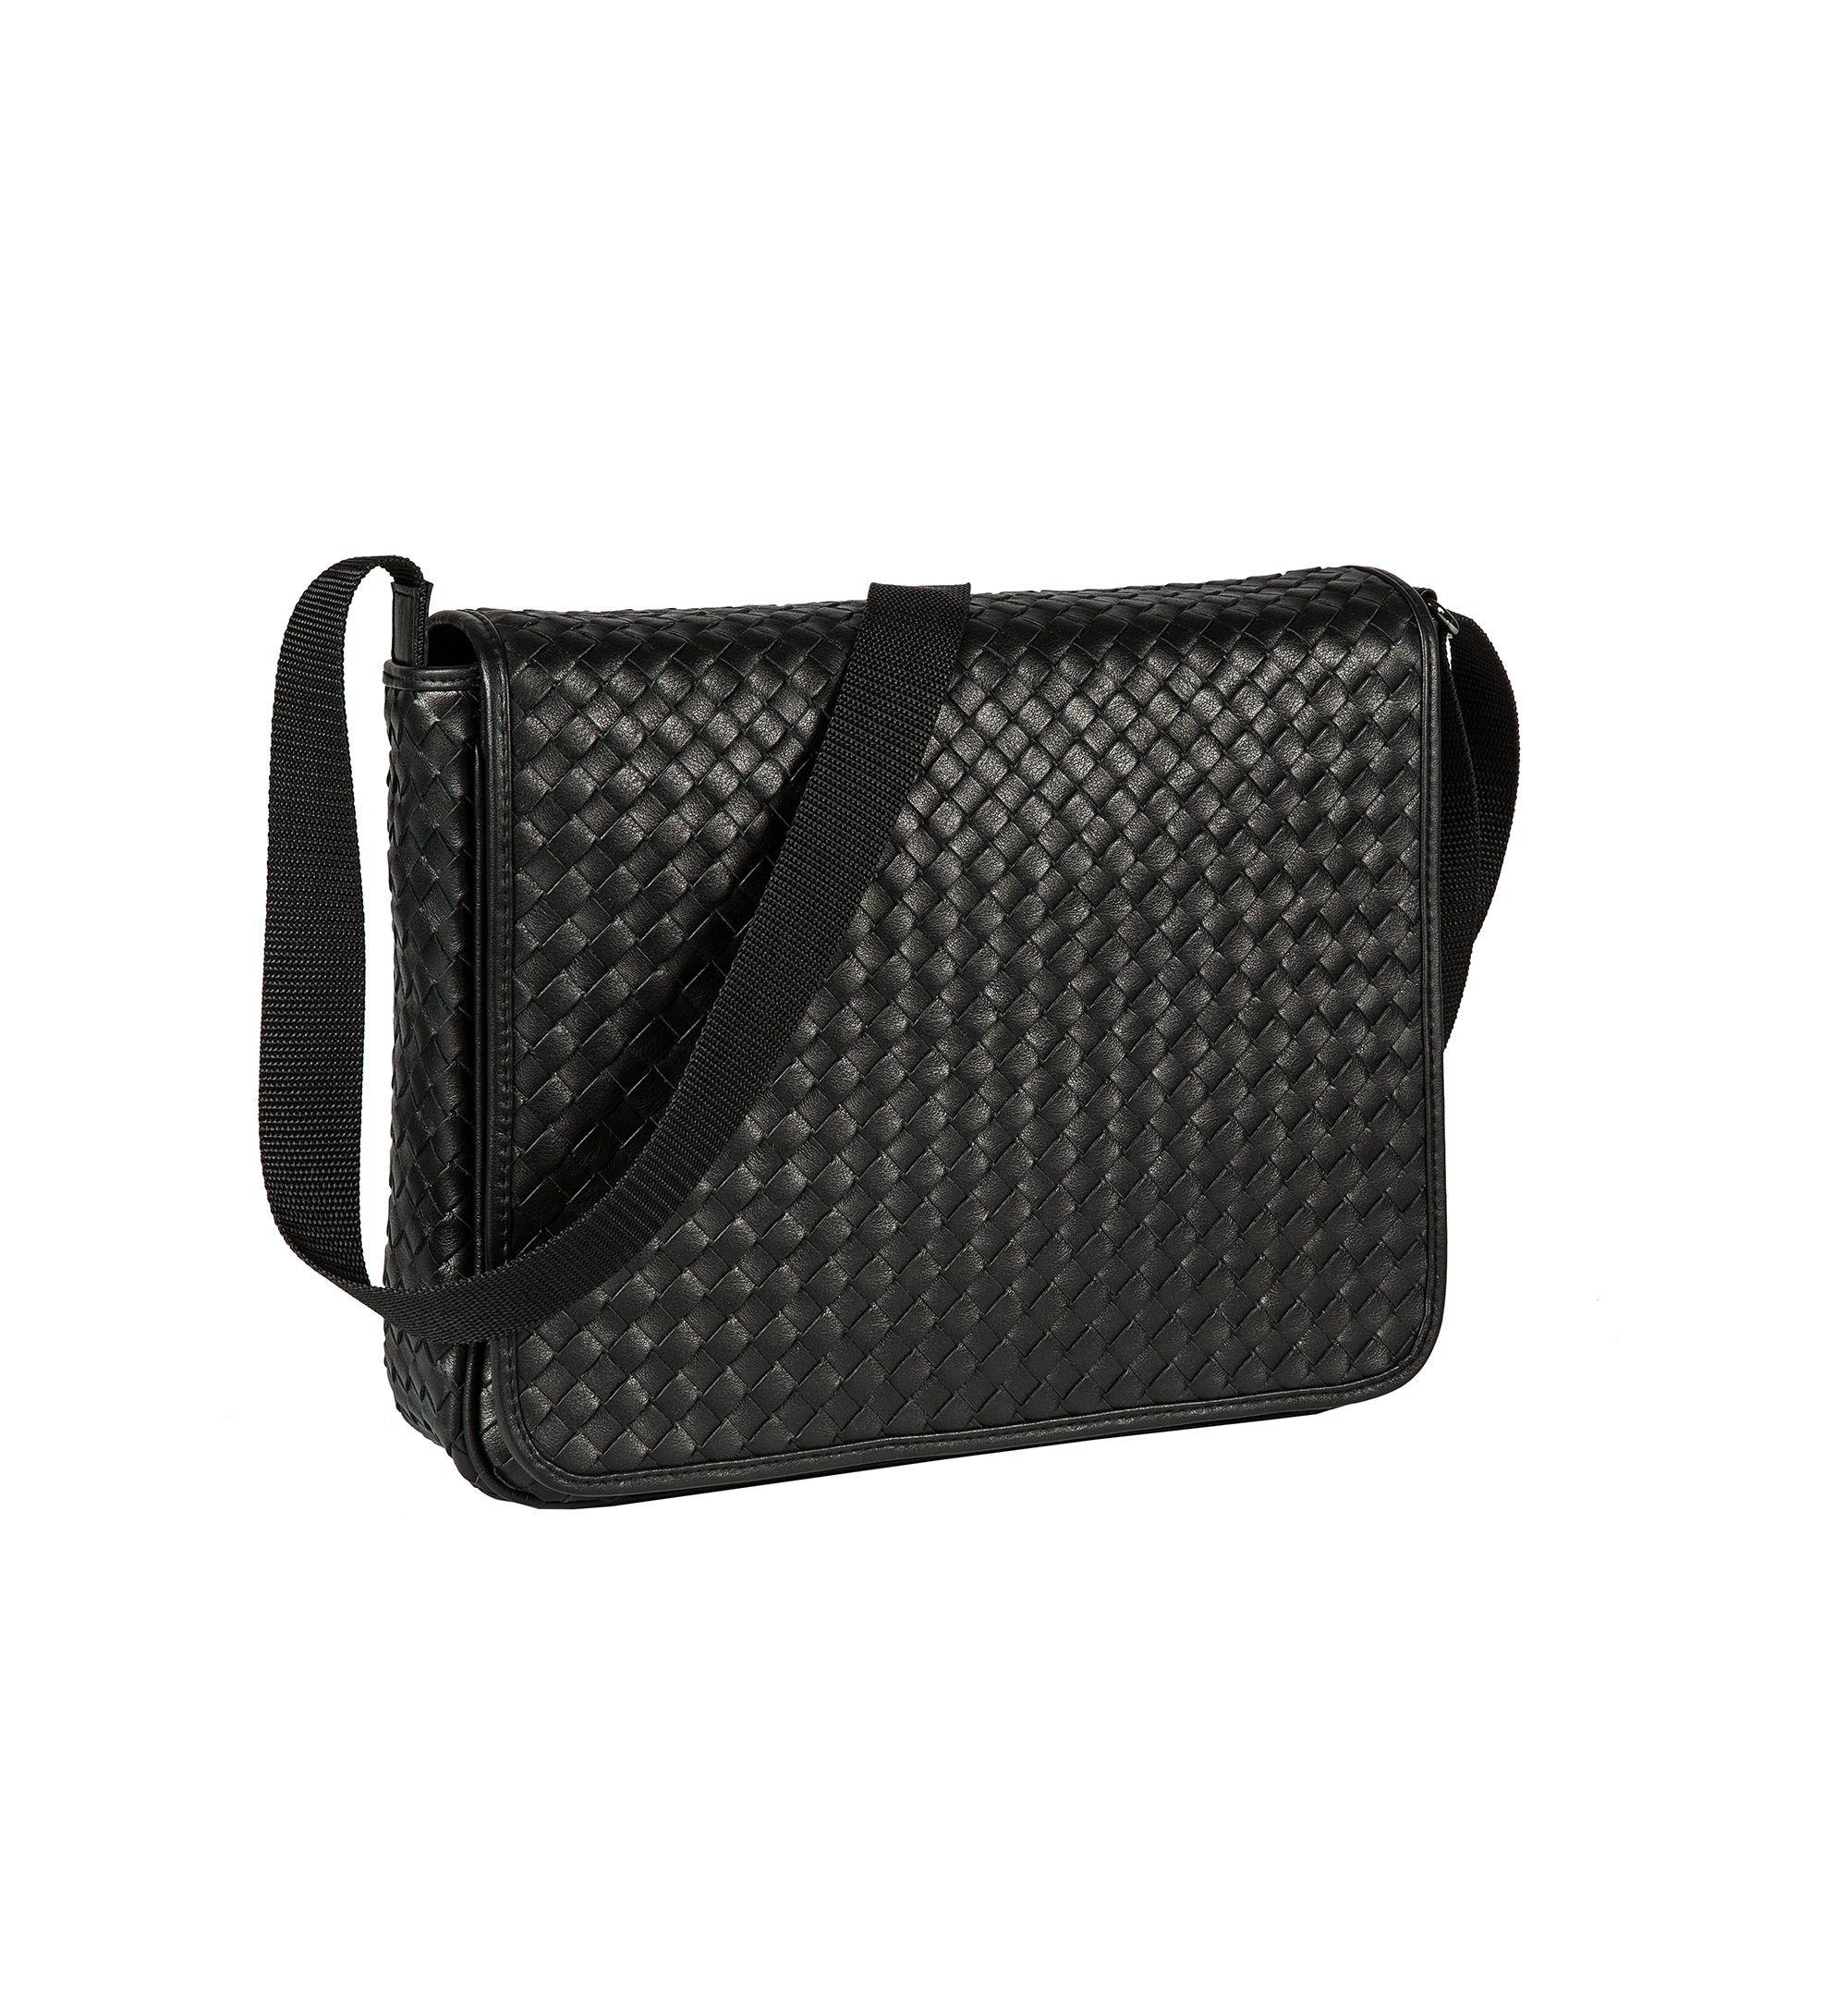 Handcrafted shoulder bag by Eckerle http://www.eckerle.de/accessoires/taschen/